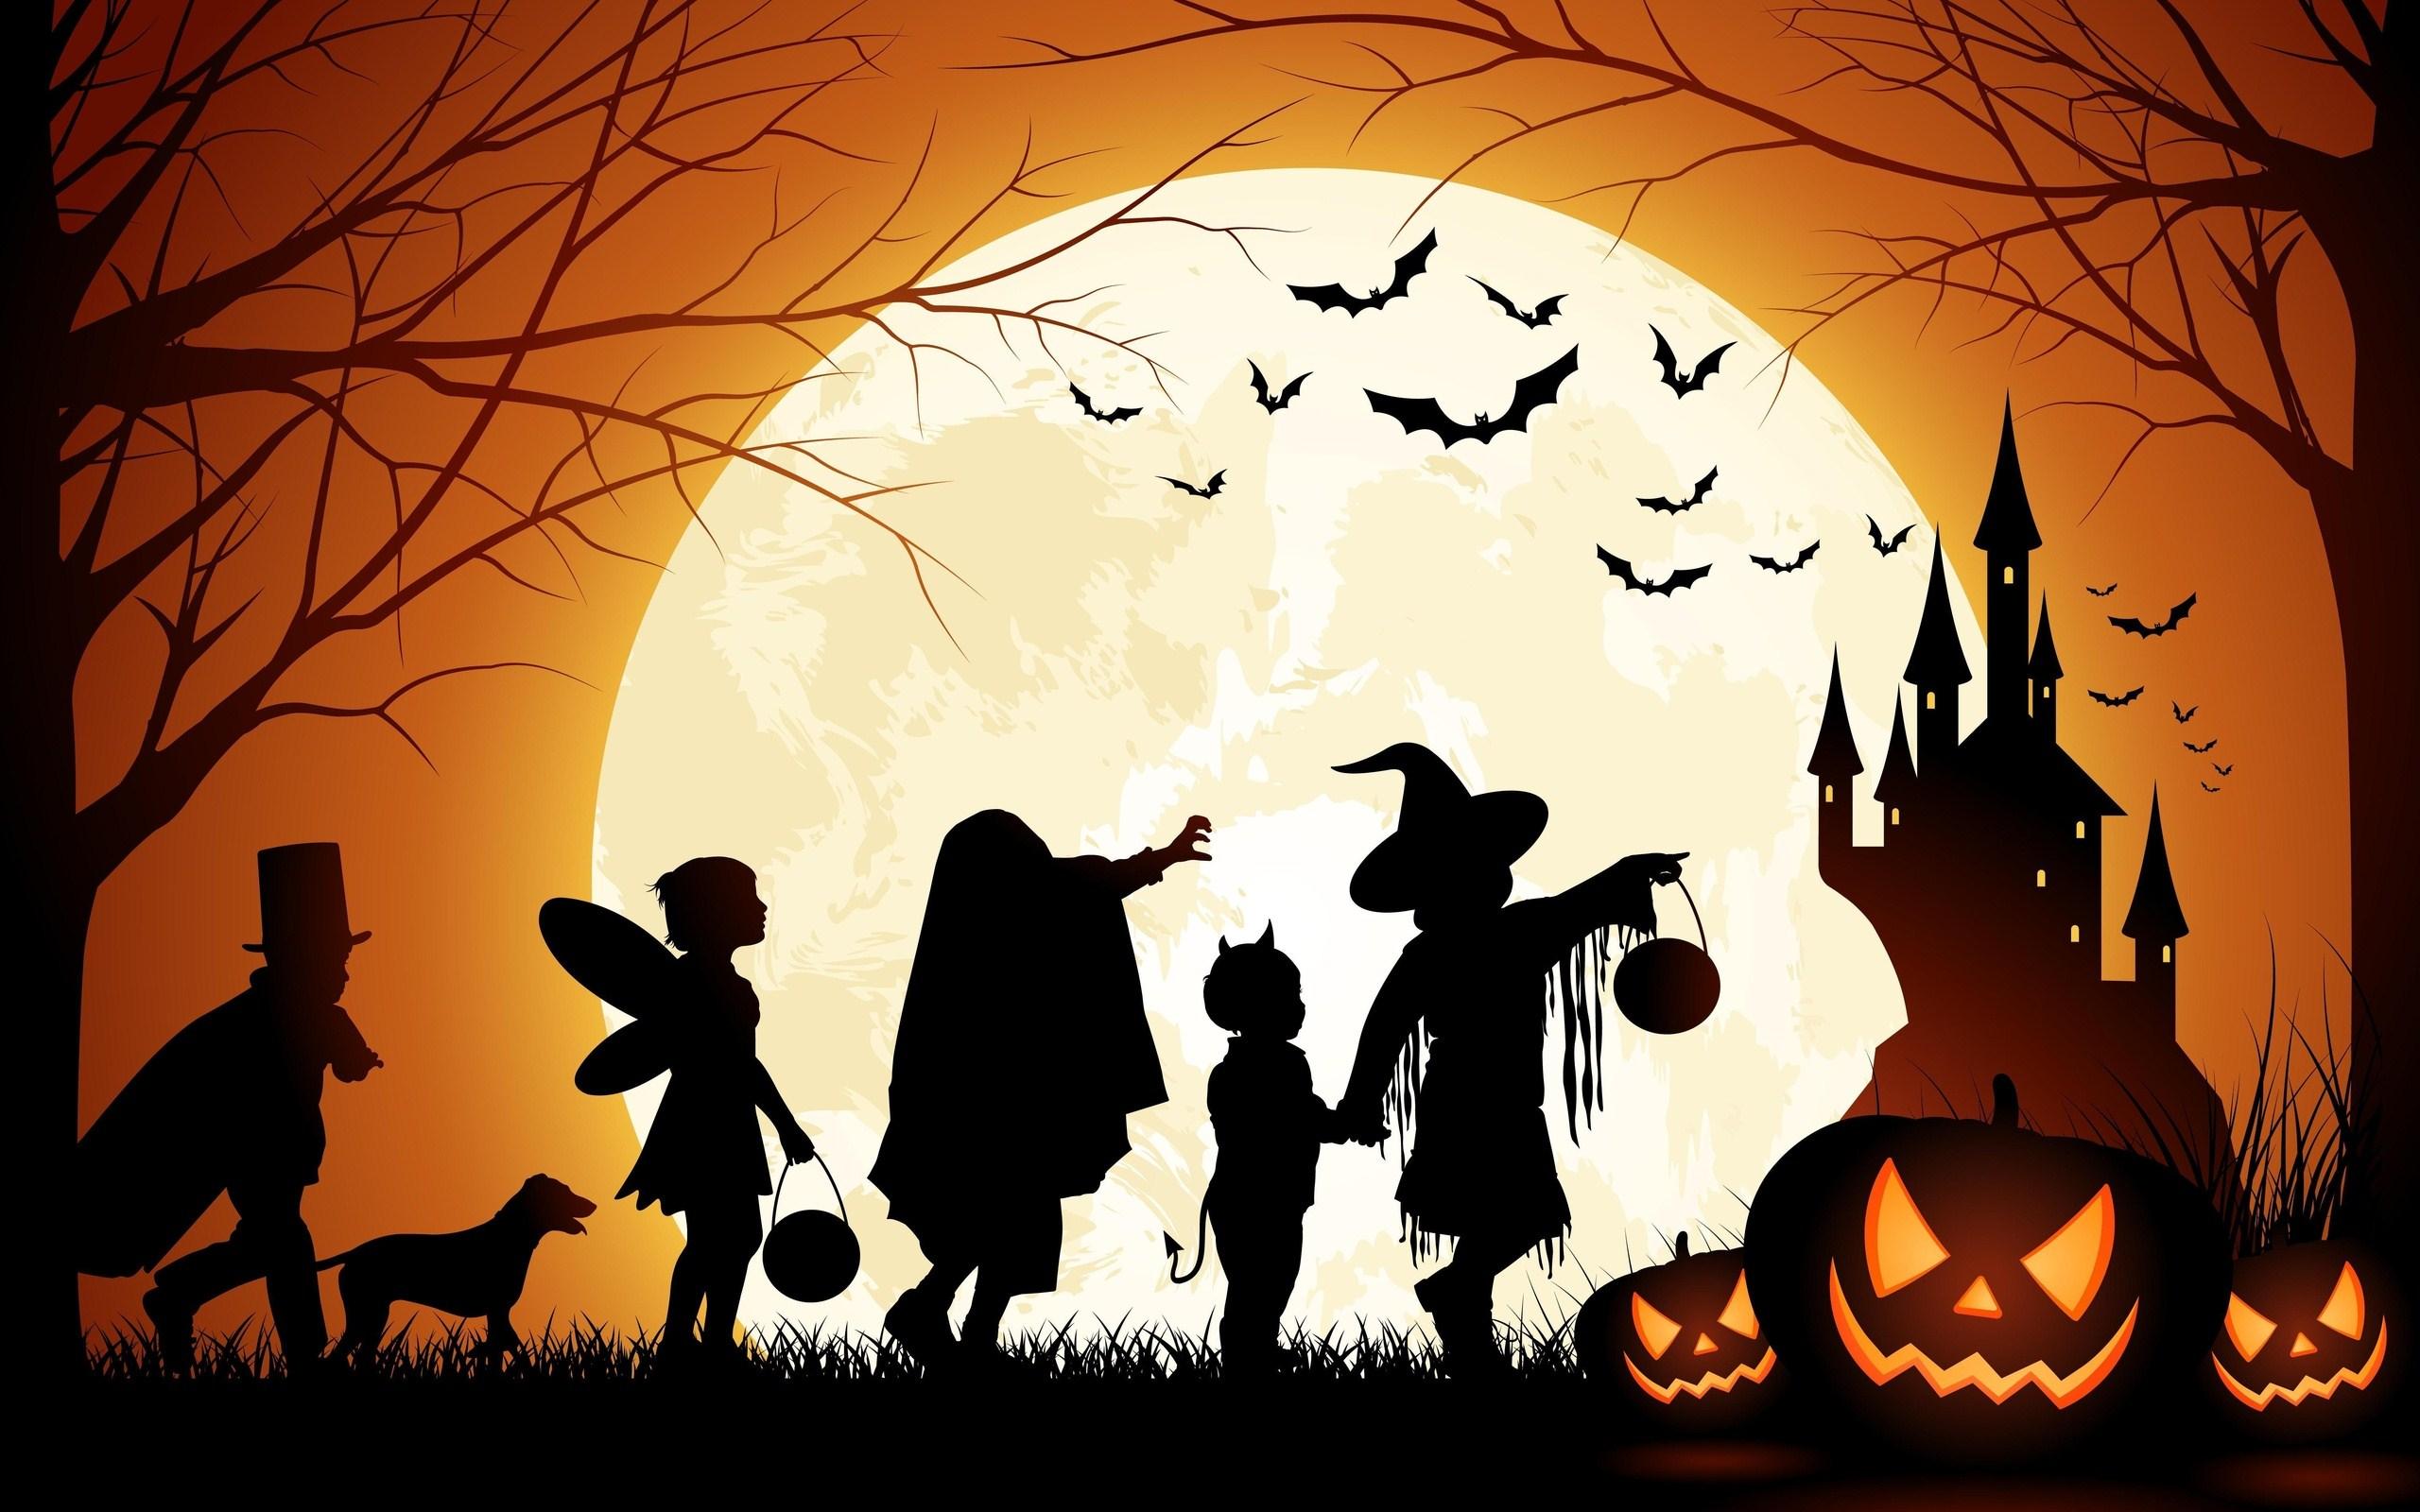 Halloween Wallpaper For Kids 4 2560x1600